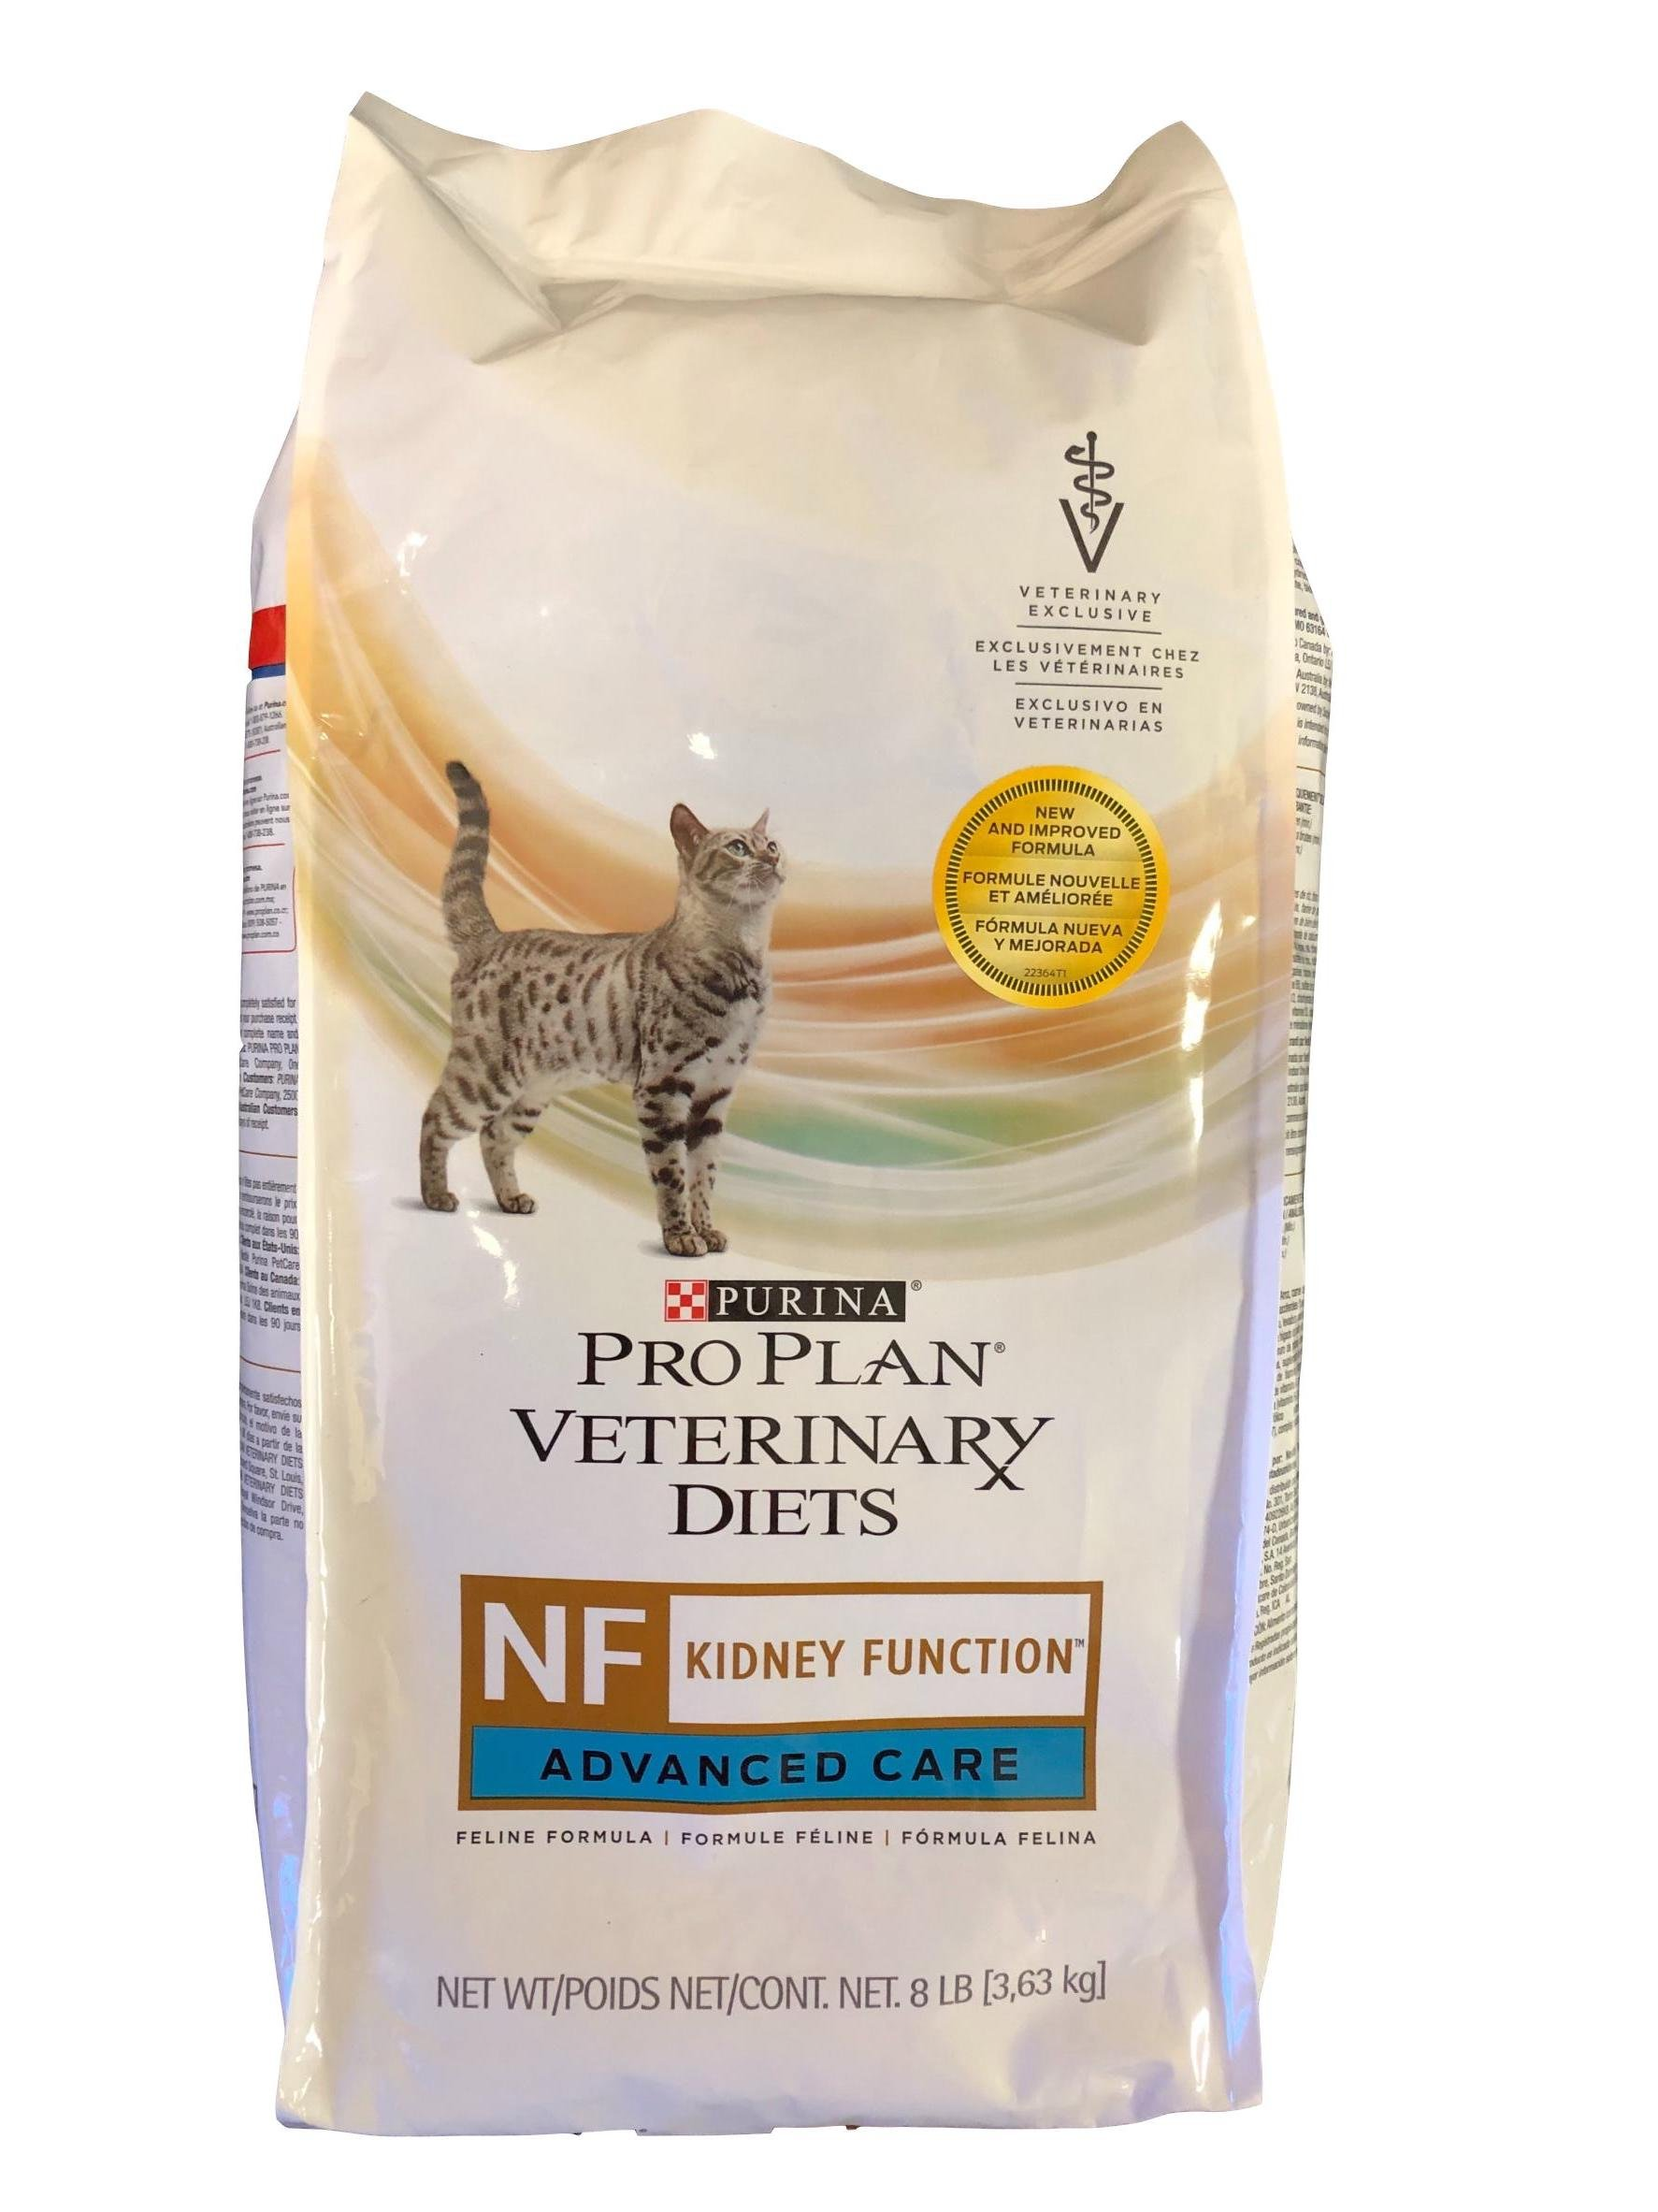 Purina Pro Plan Veterinary Diets 17888 Ppvd Feline Nf Advn Care Cat Food, 8 lb by Purina Pro Plan Veterinary Diets